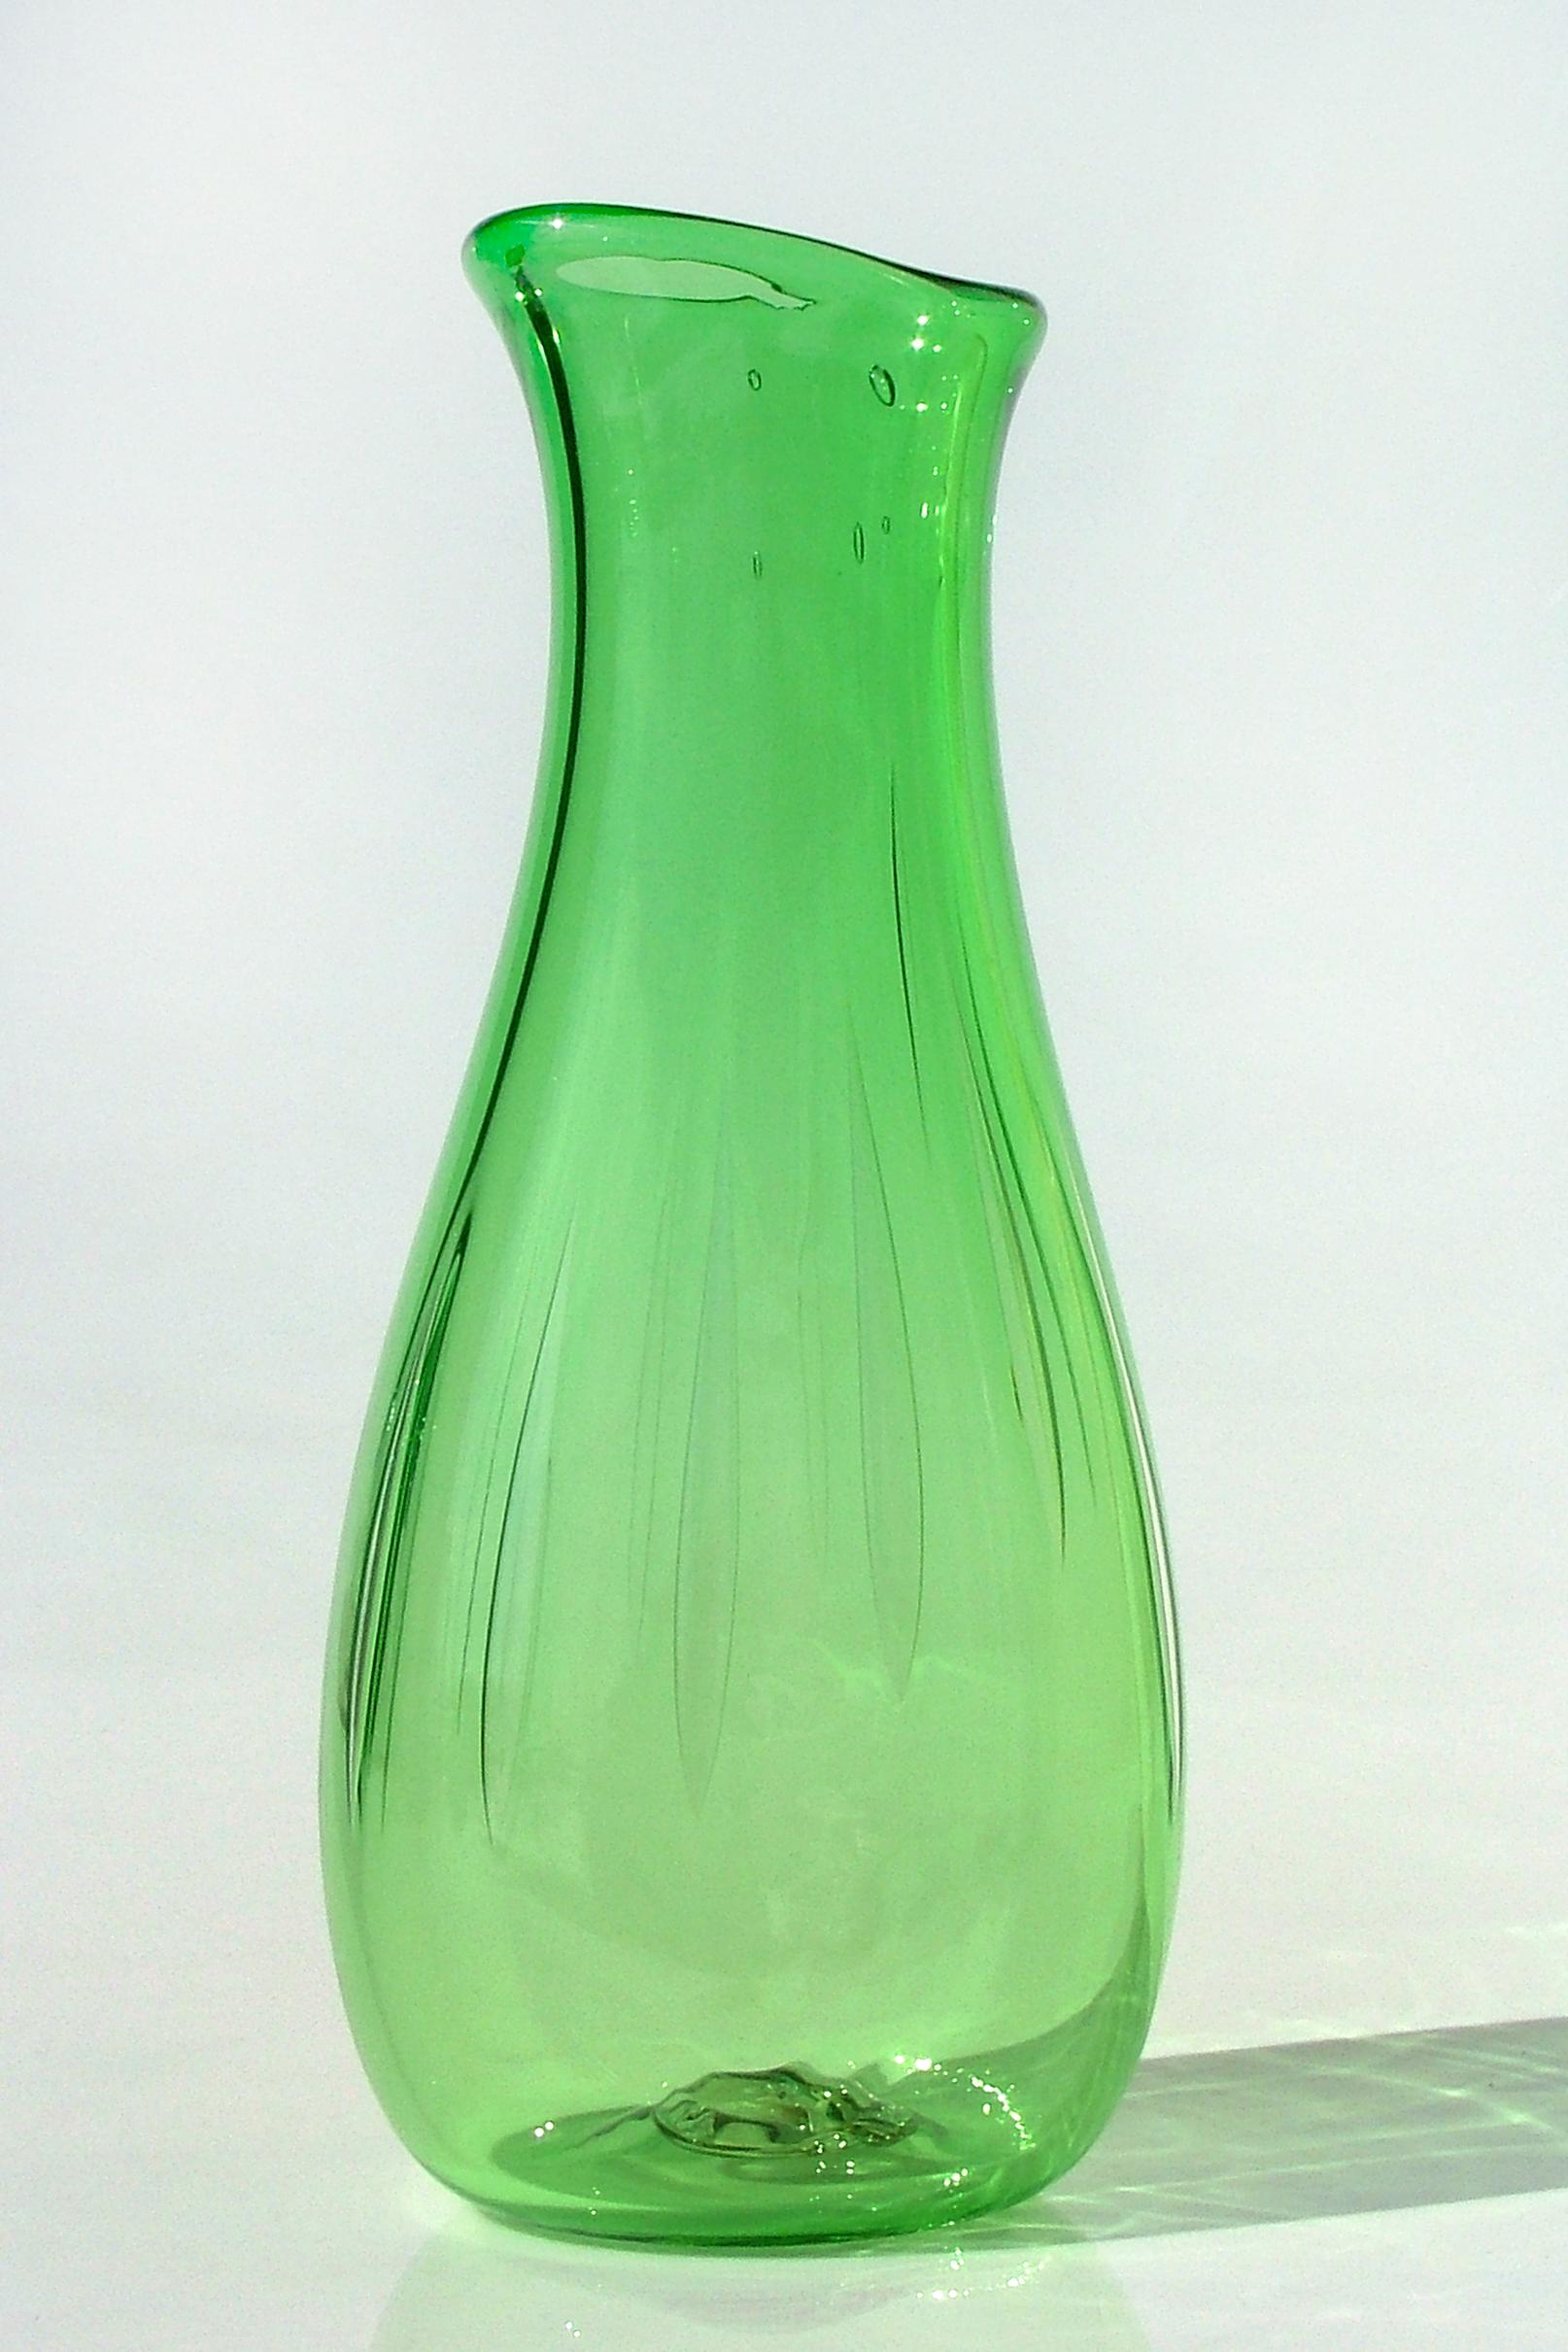 greenbubb